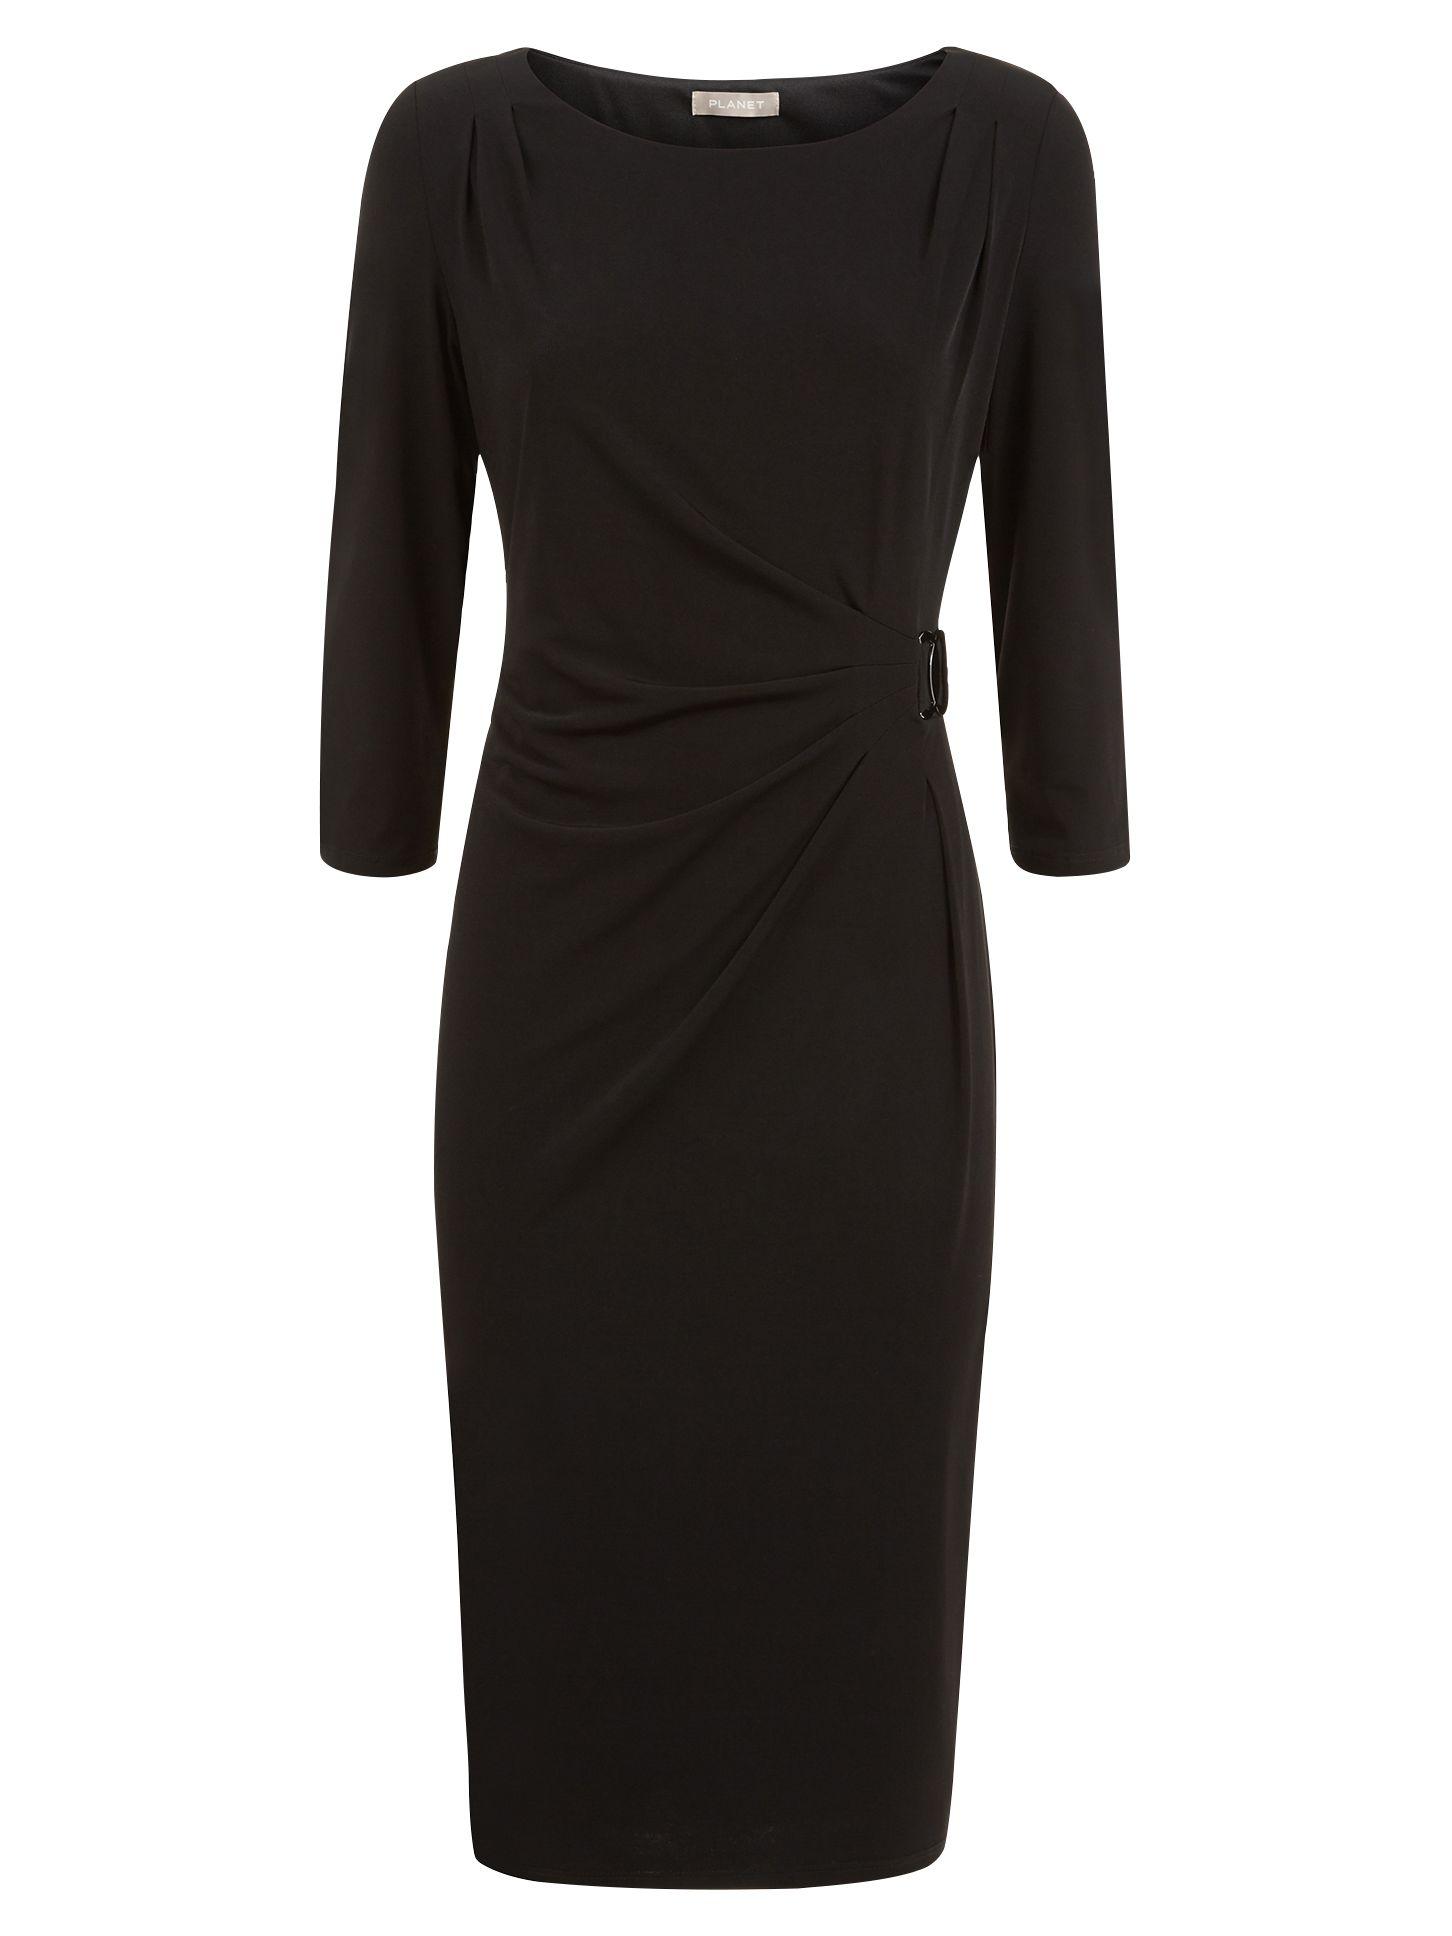 planet buckle dress, planet, buckle, dress, black|black|black|black|black|black|black|cerise|cerise|cerise|cerise|cerise|cerise|cerise, 14|12|16|8|10|20|18|16|10|12|8|14|20|18, women, plus size, womens dresses, special offers, womenswear offers, womens dresses offers, 1897465